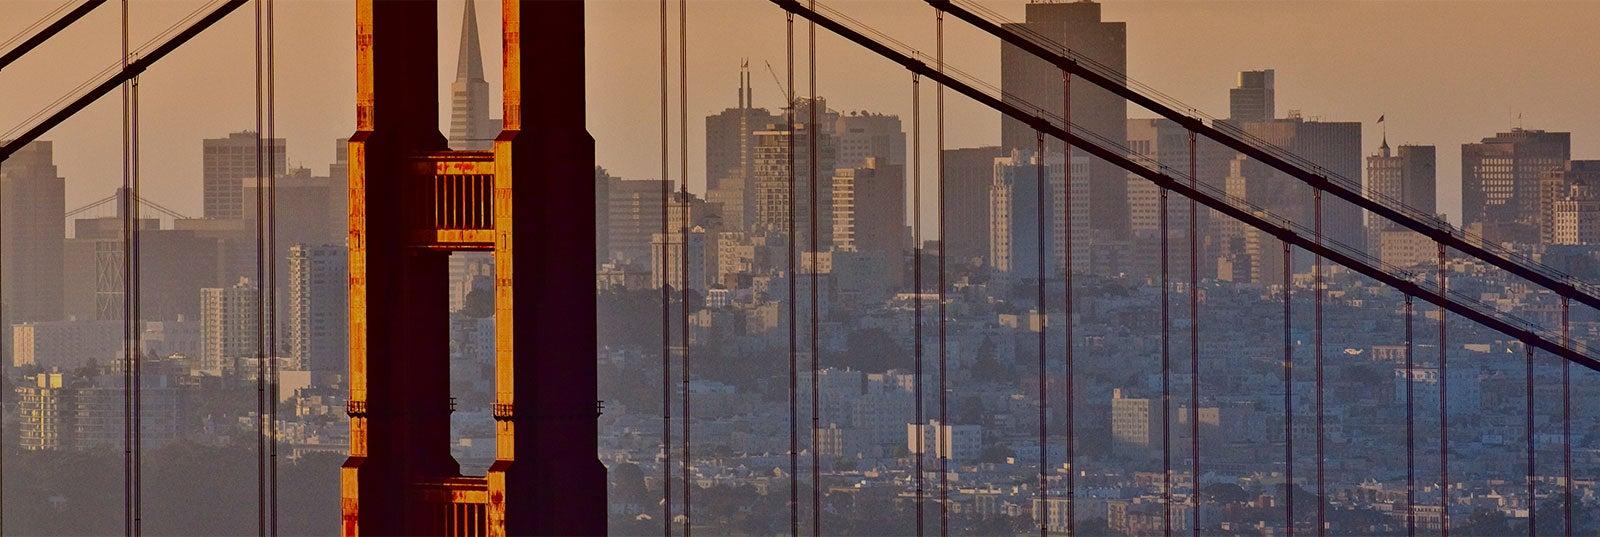 Guía turística de São Francisco